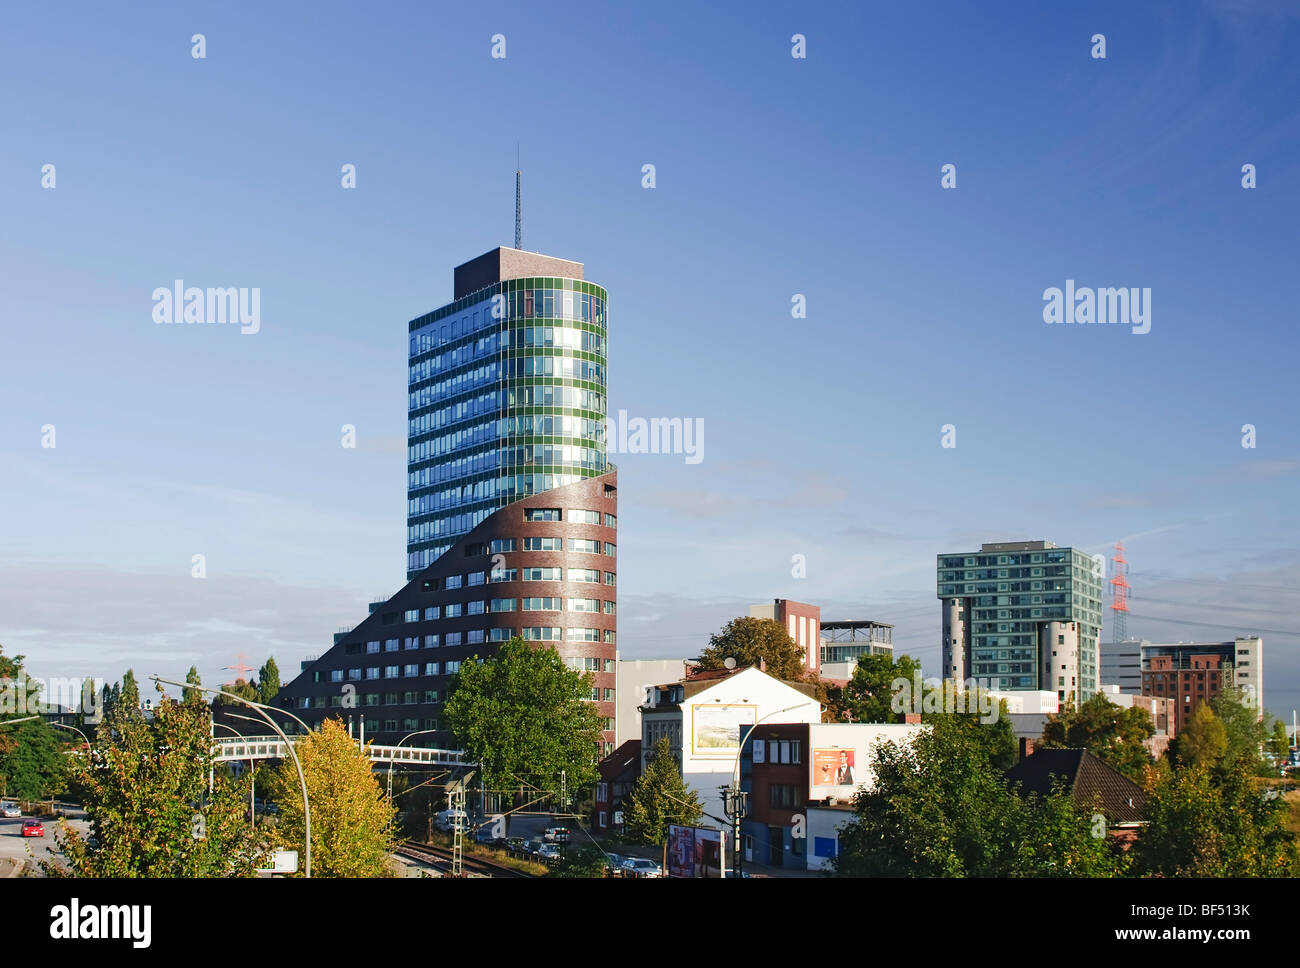 Modernes Büro tower Channel, Channel Harburg Harburg Hafen Port Landkreis Harburg, Hamburg, Germany, Europe Stockbild